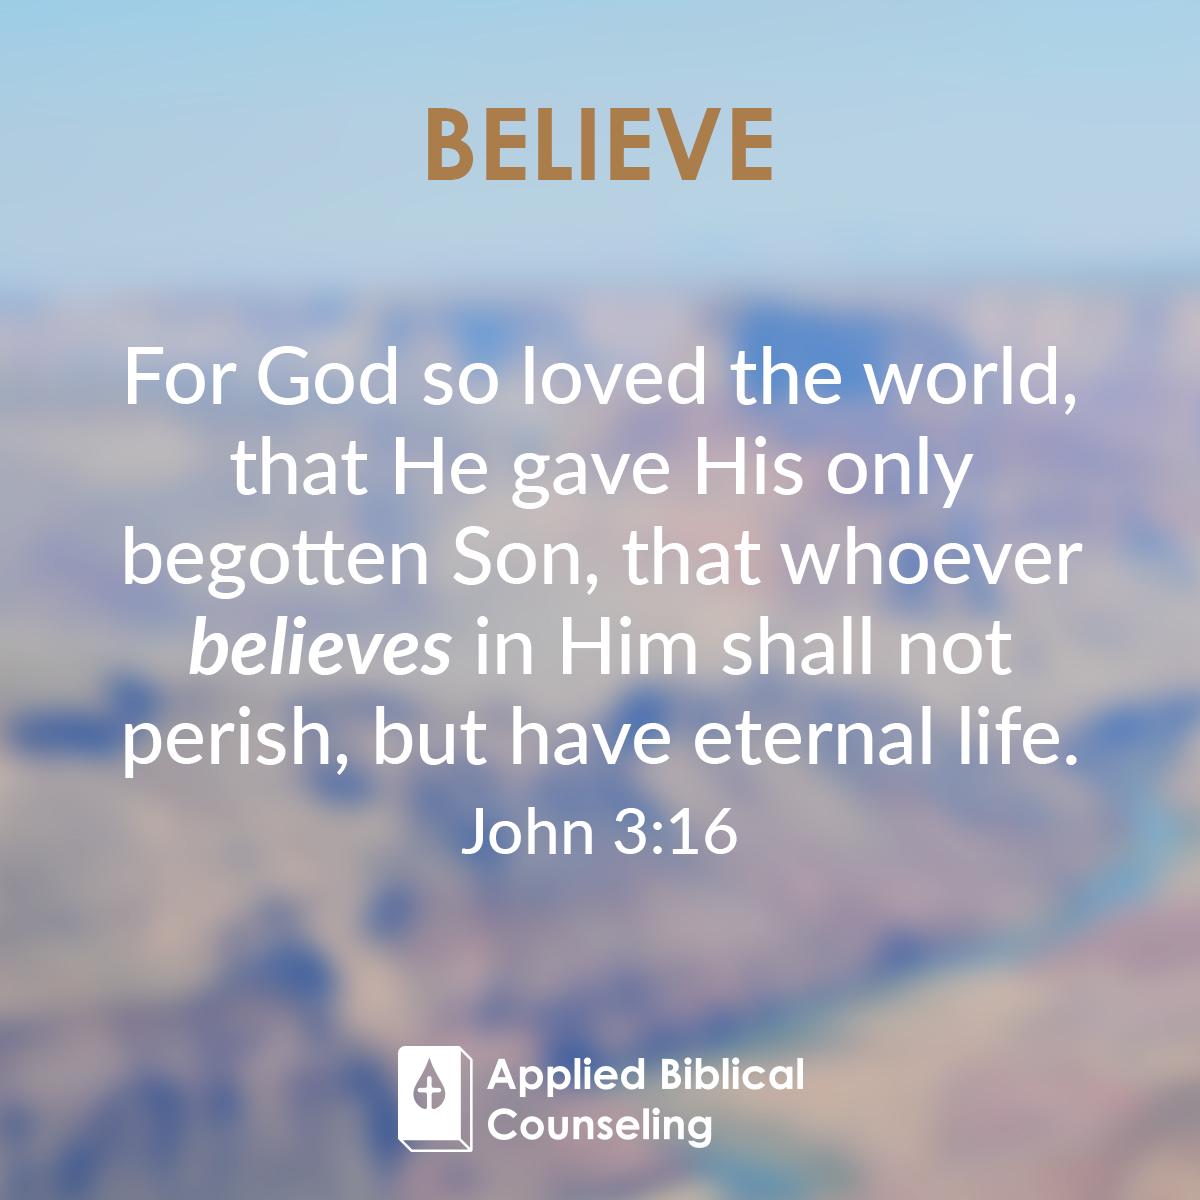 applied biblical counseling facebook w17 believe 3